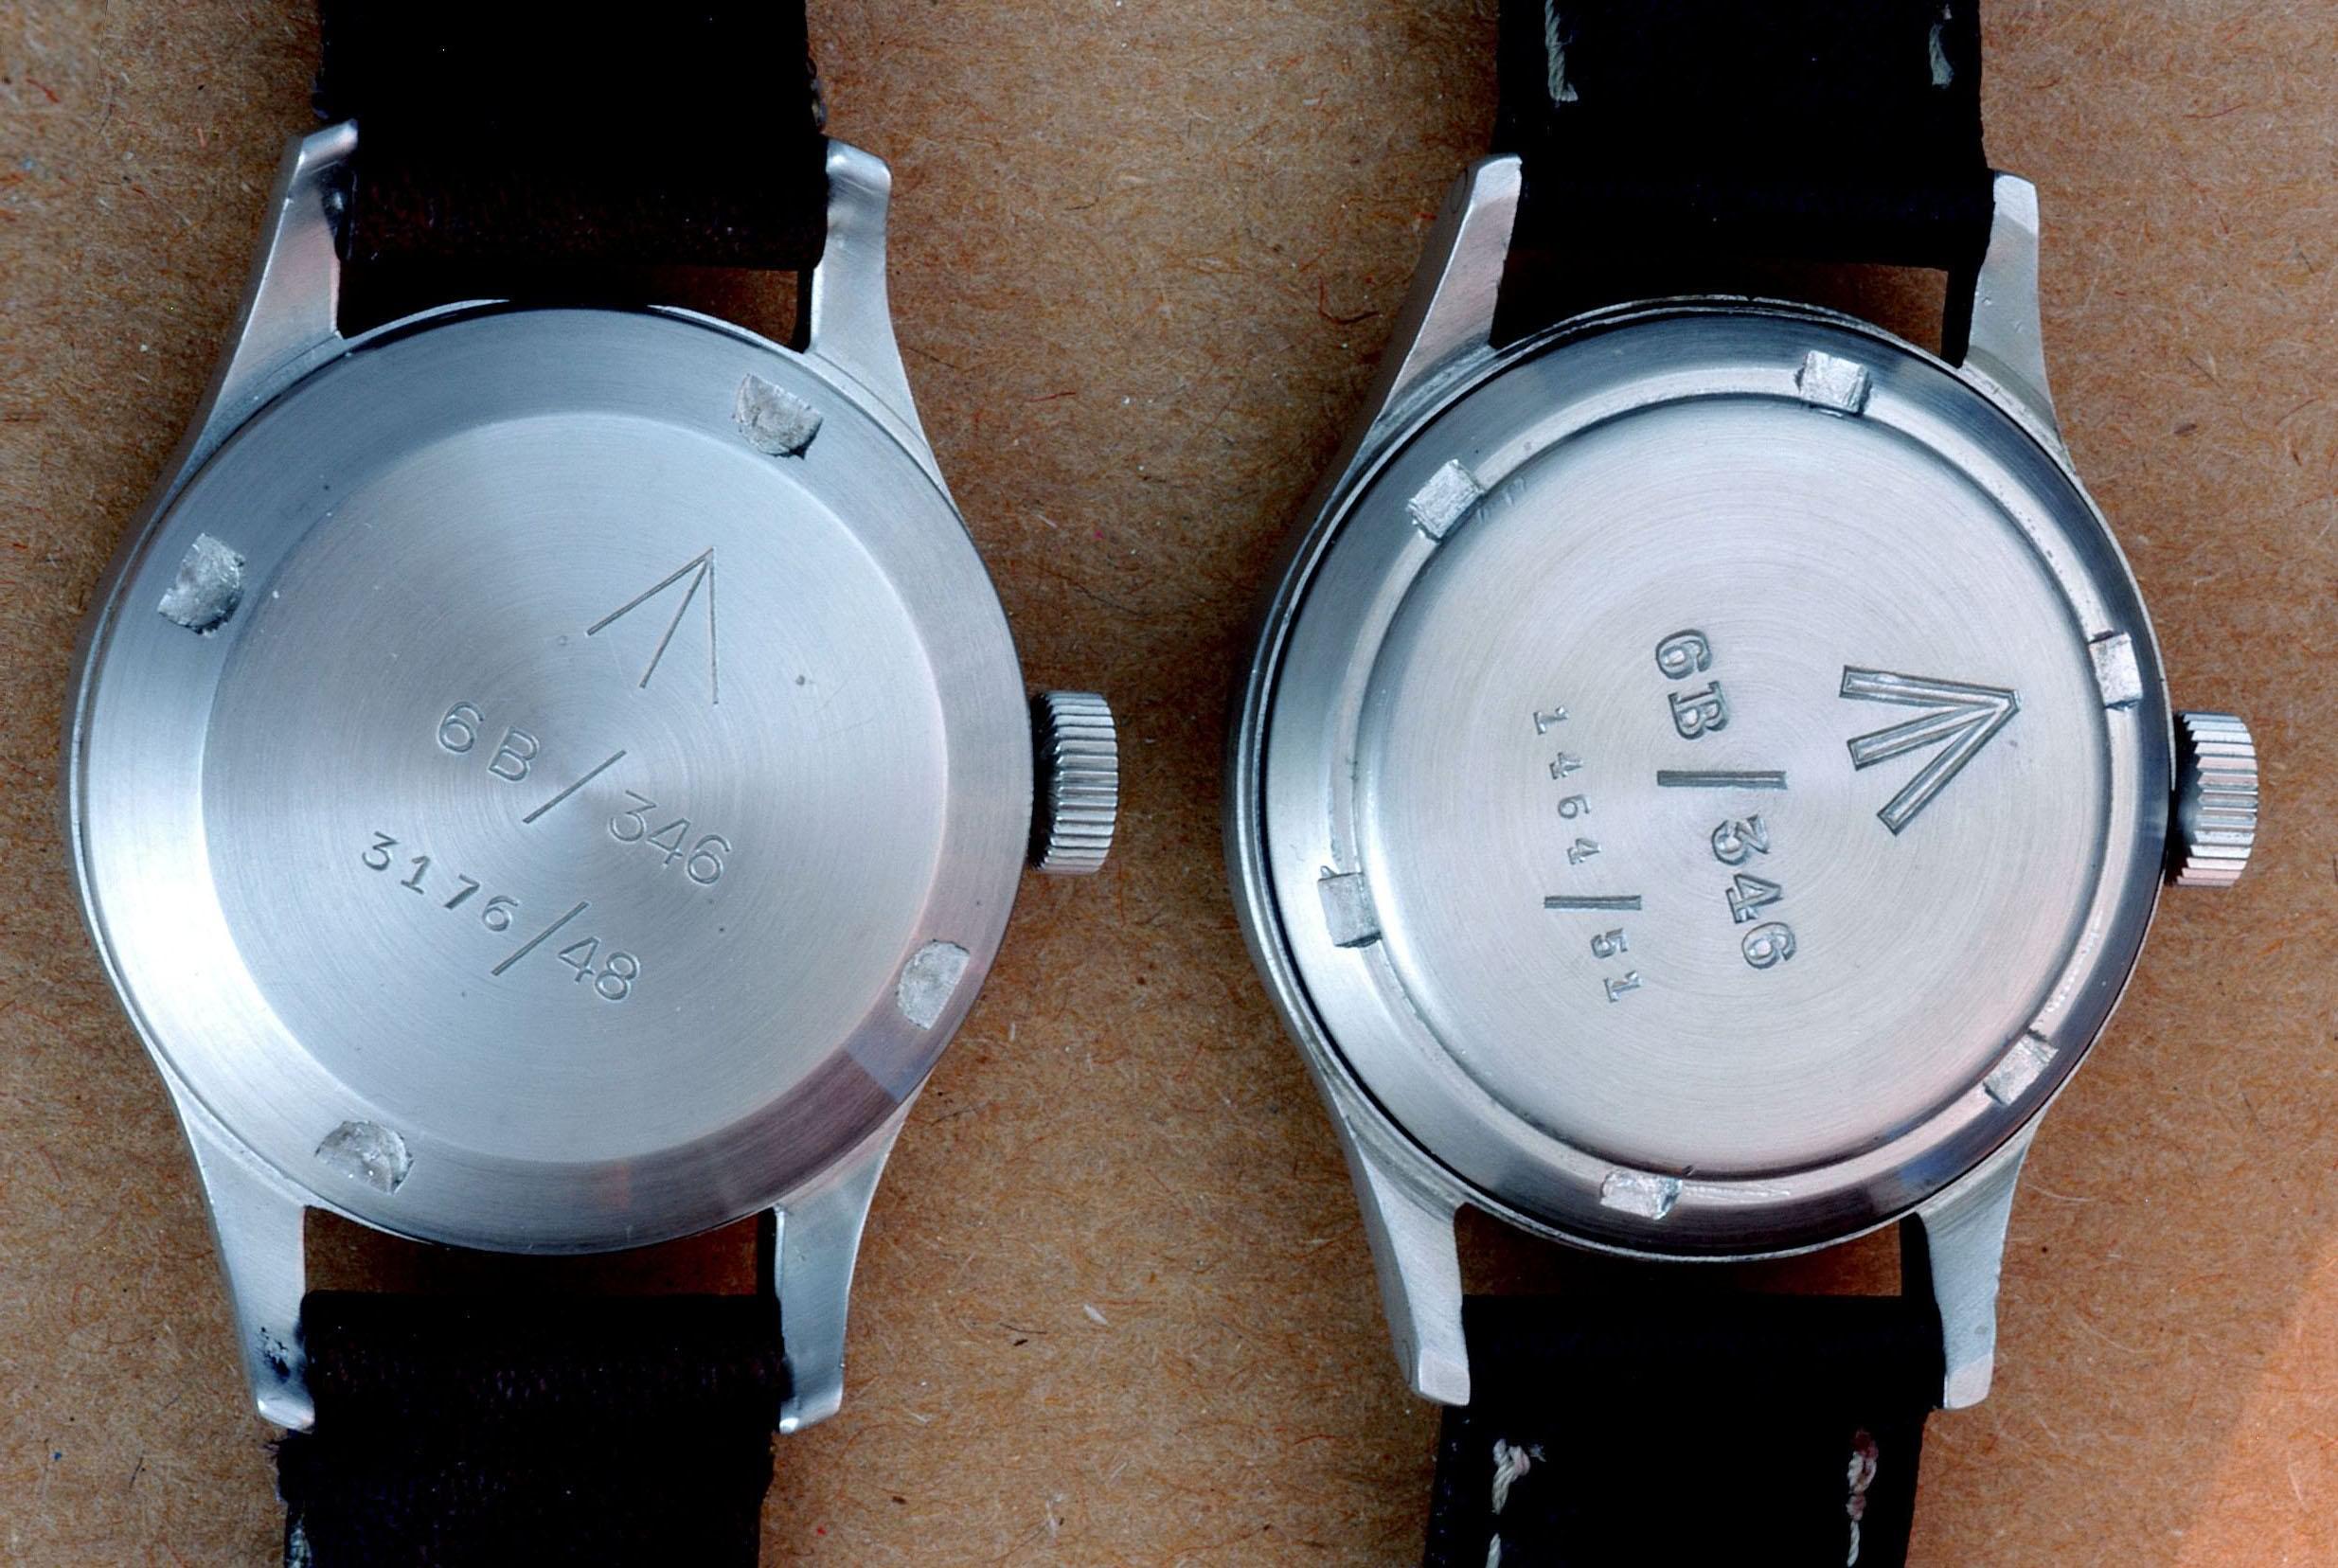 Watch marks on wrist - Jlc Diameter 35 3 Mm Lug To Lug 46 3 Mm Height W Crystal 12 6 Mm